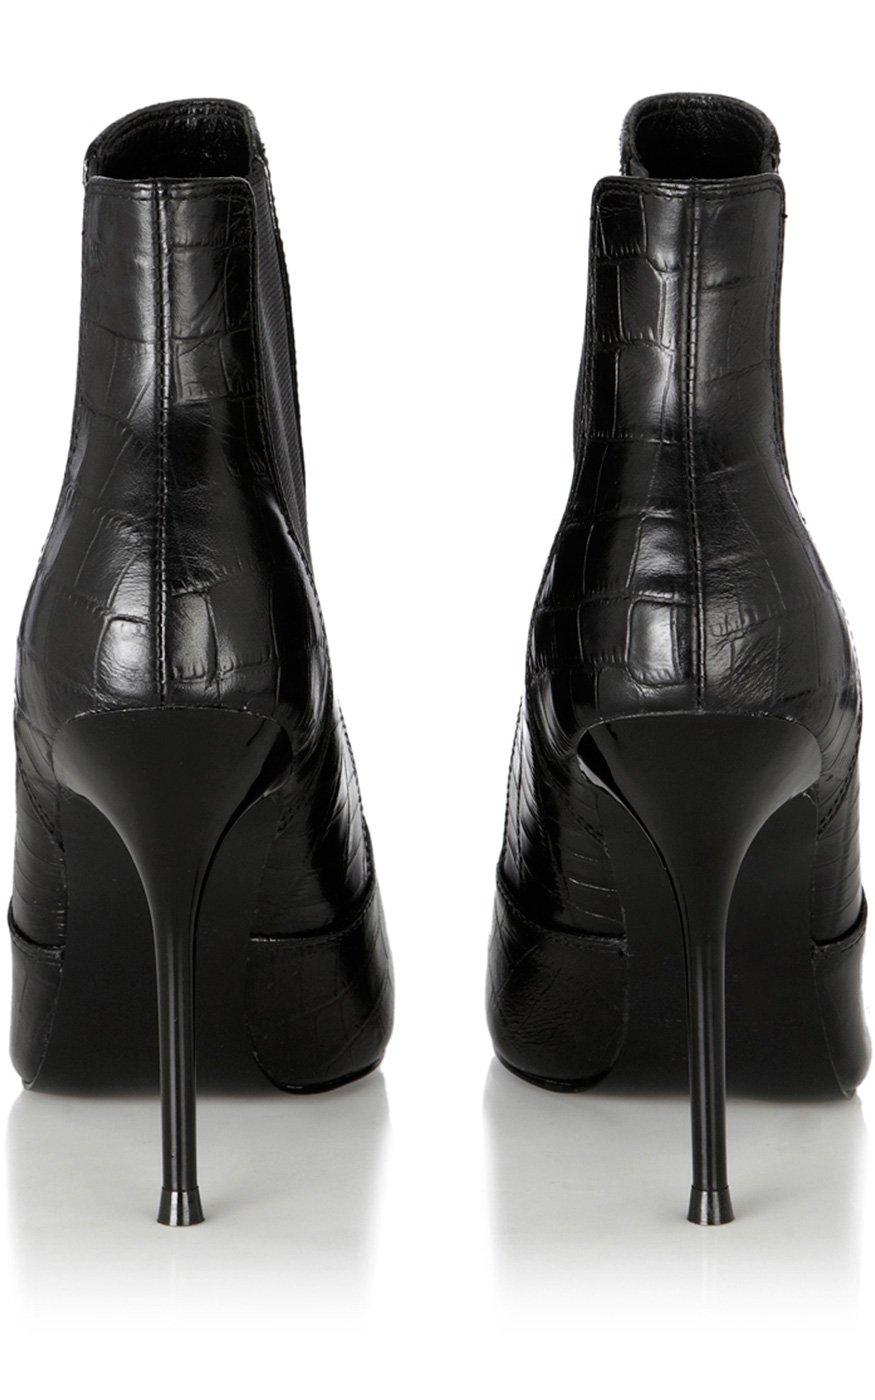 748ac304aadd8 Karen Millen Croc Ankle Boot in Black - Lyst